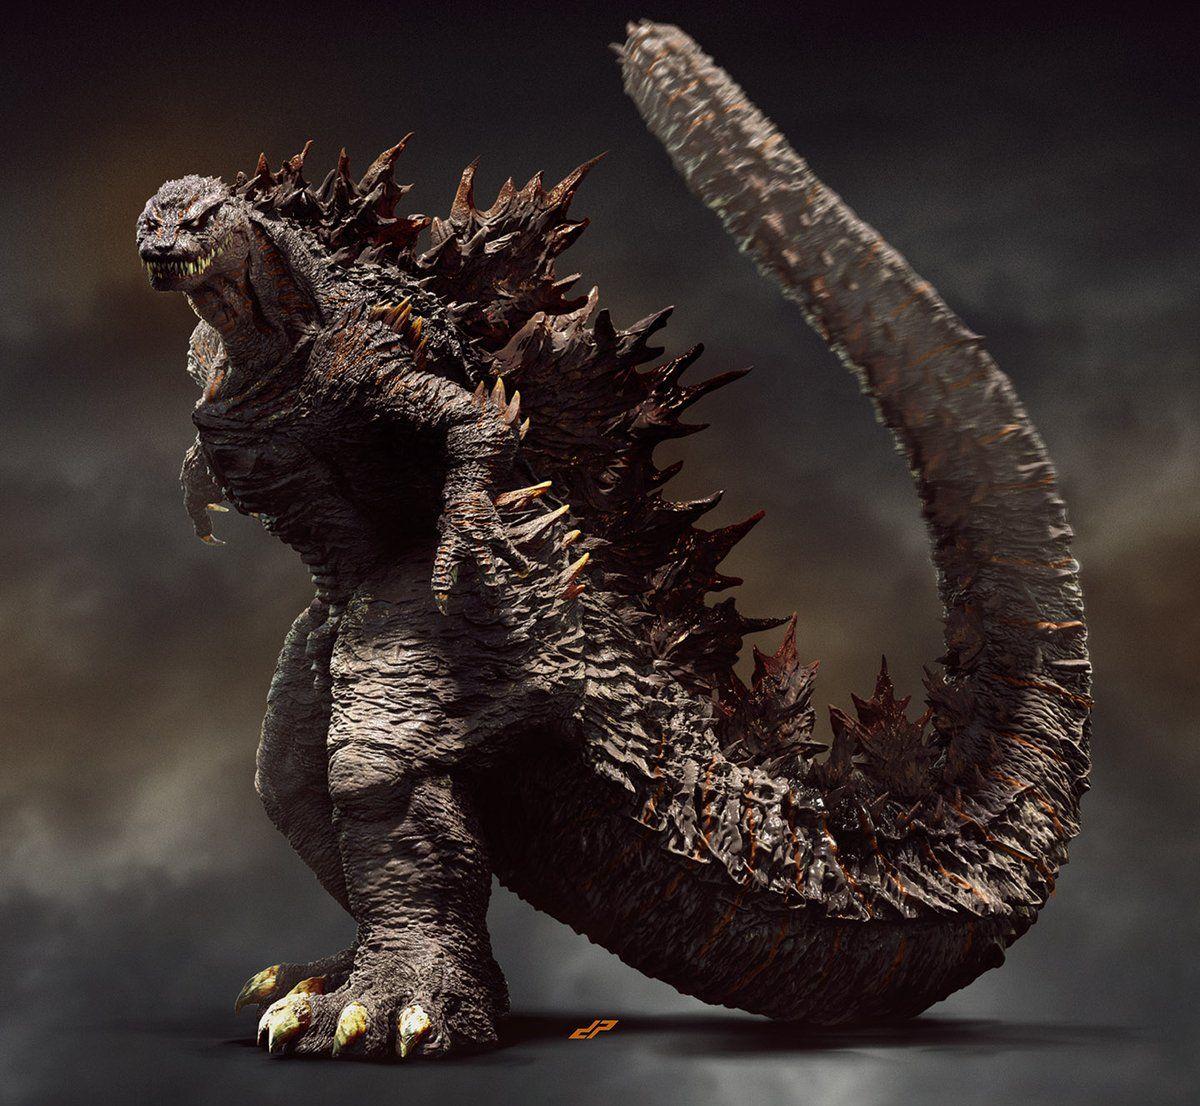 Dopepope(D0PEP0PE)さん Twitter in 2020 Godzilla, All